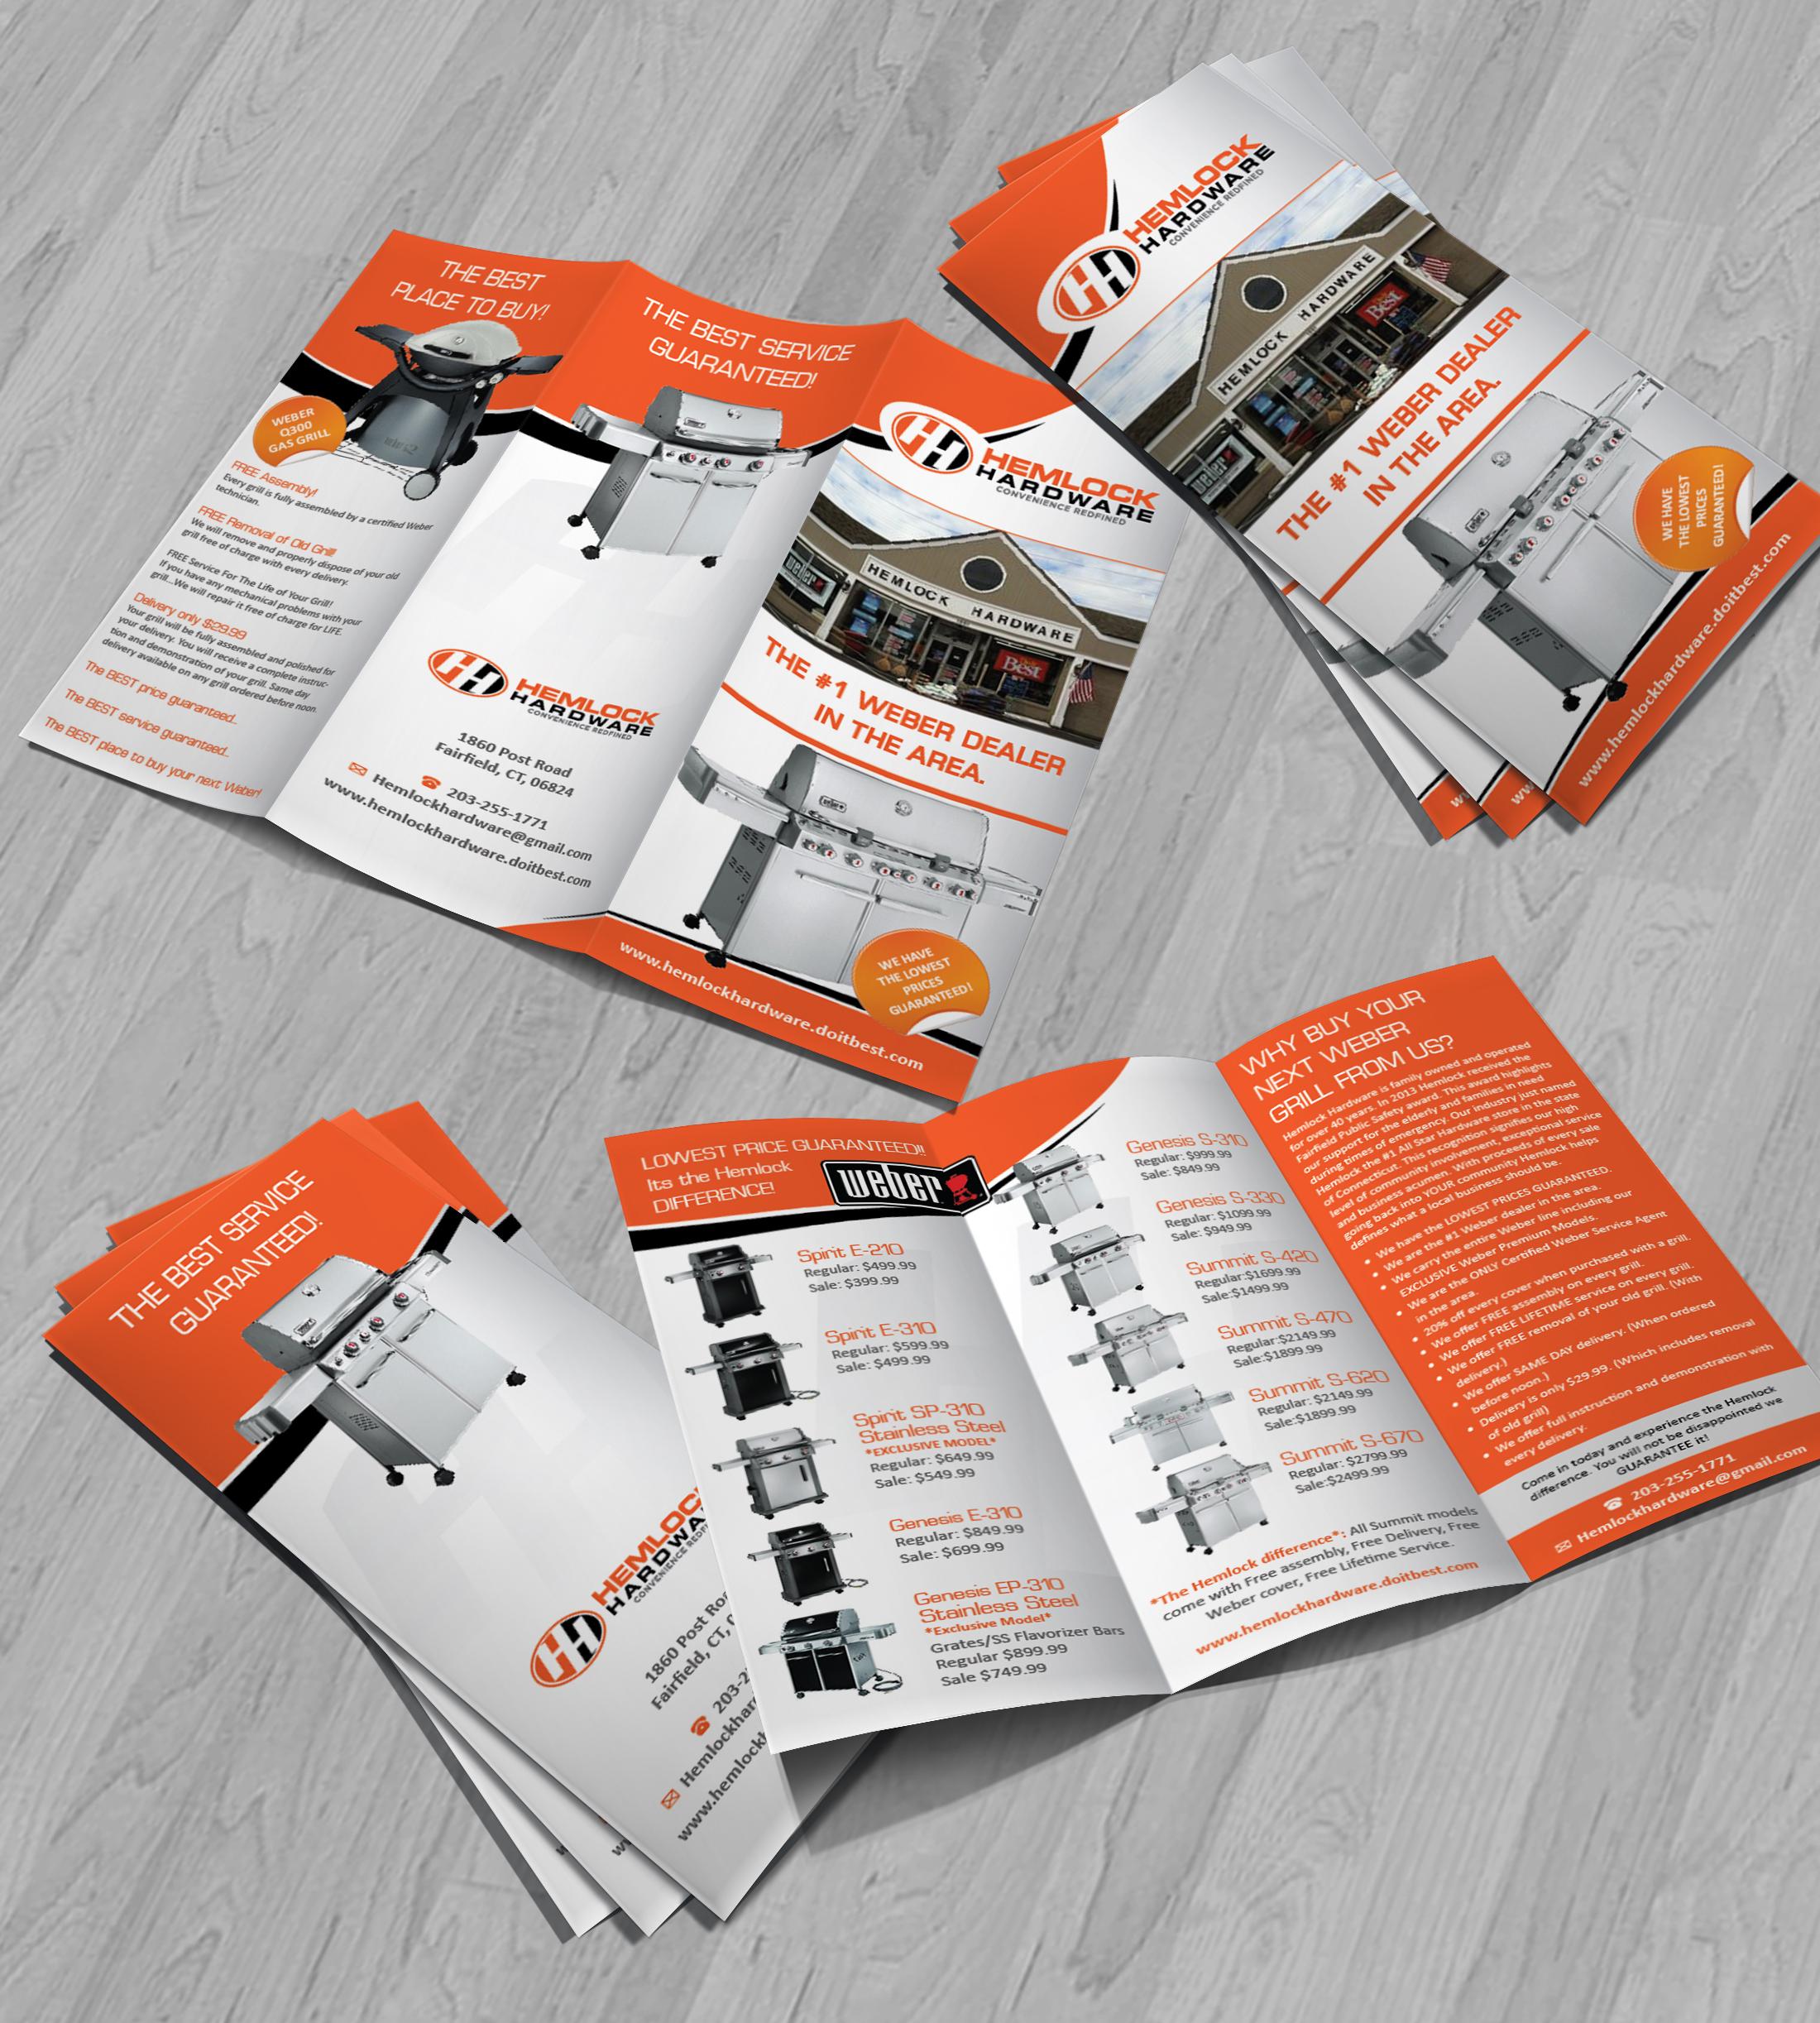 Gas Grill Brochure By Scottpez13